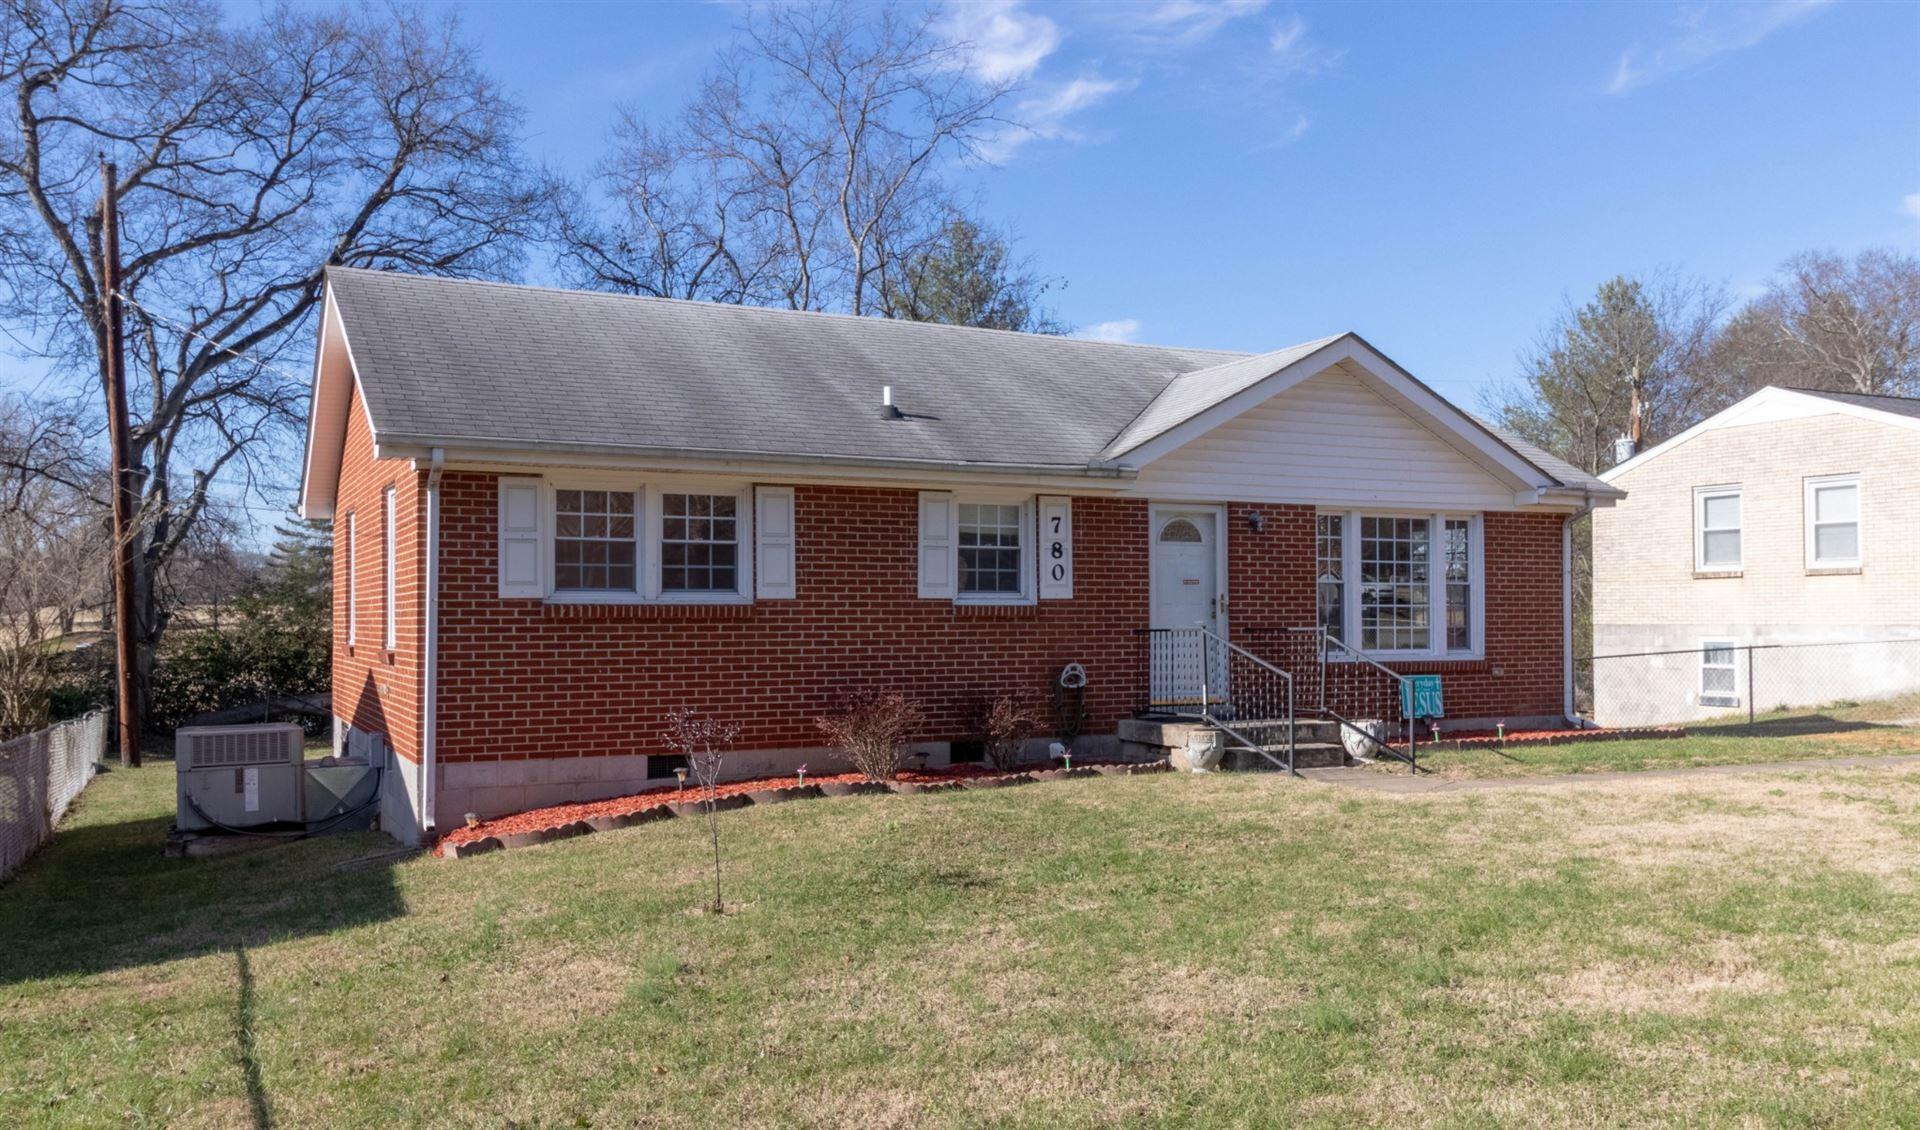 780 Hayden Dr, Clarksville, TN 37043 - MLS#: 2211020